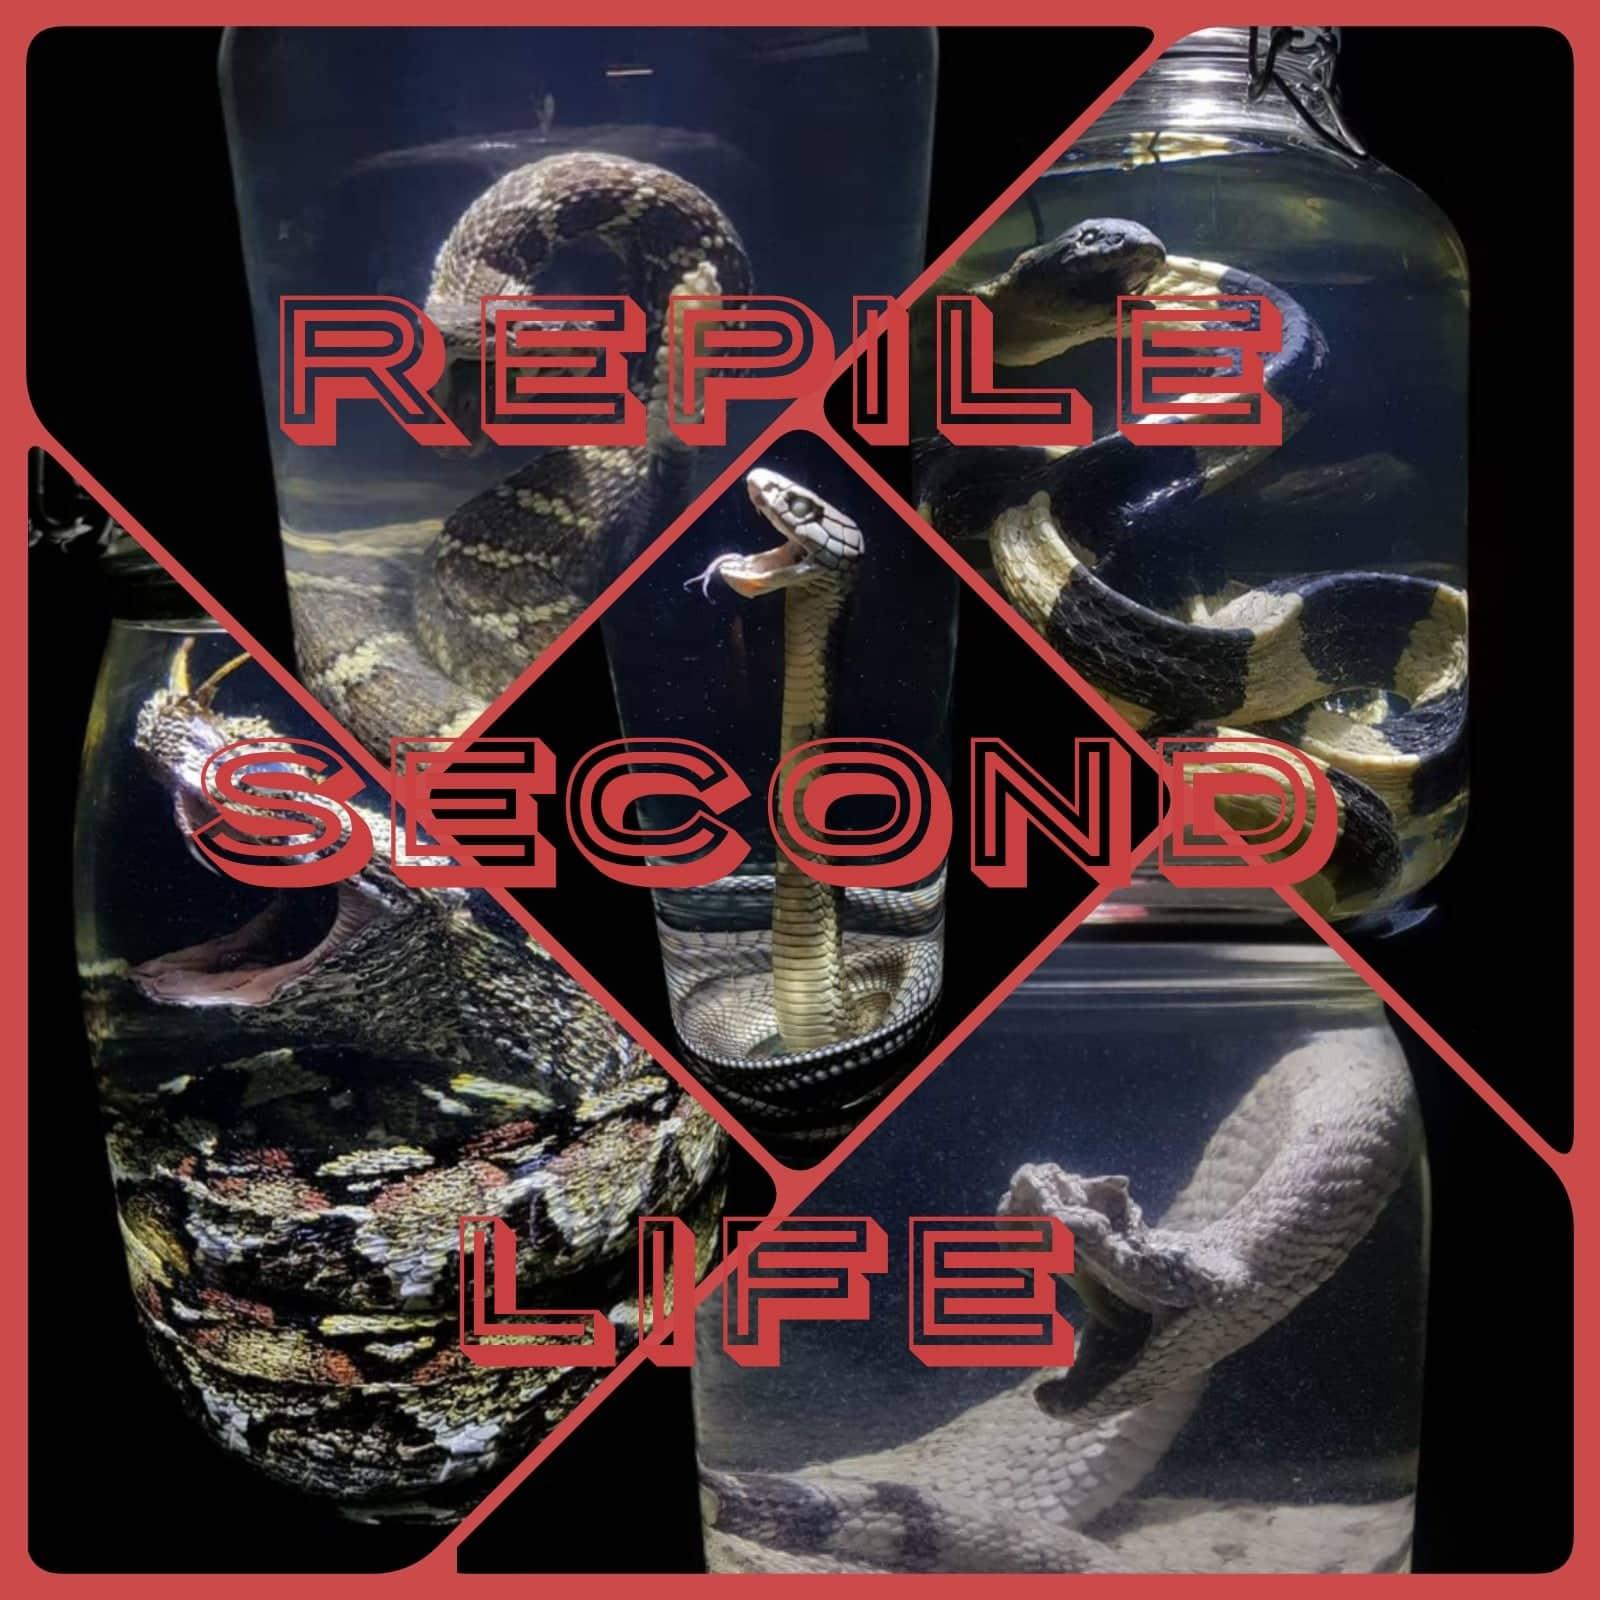 Reptile Second Life